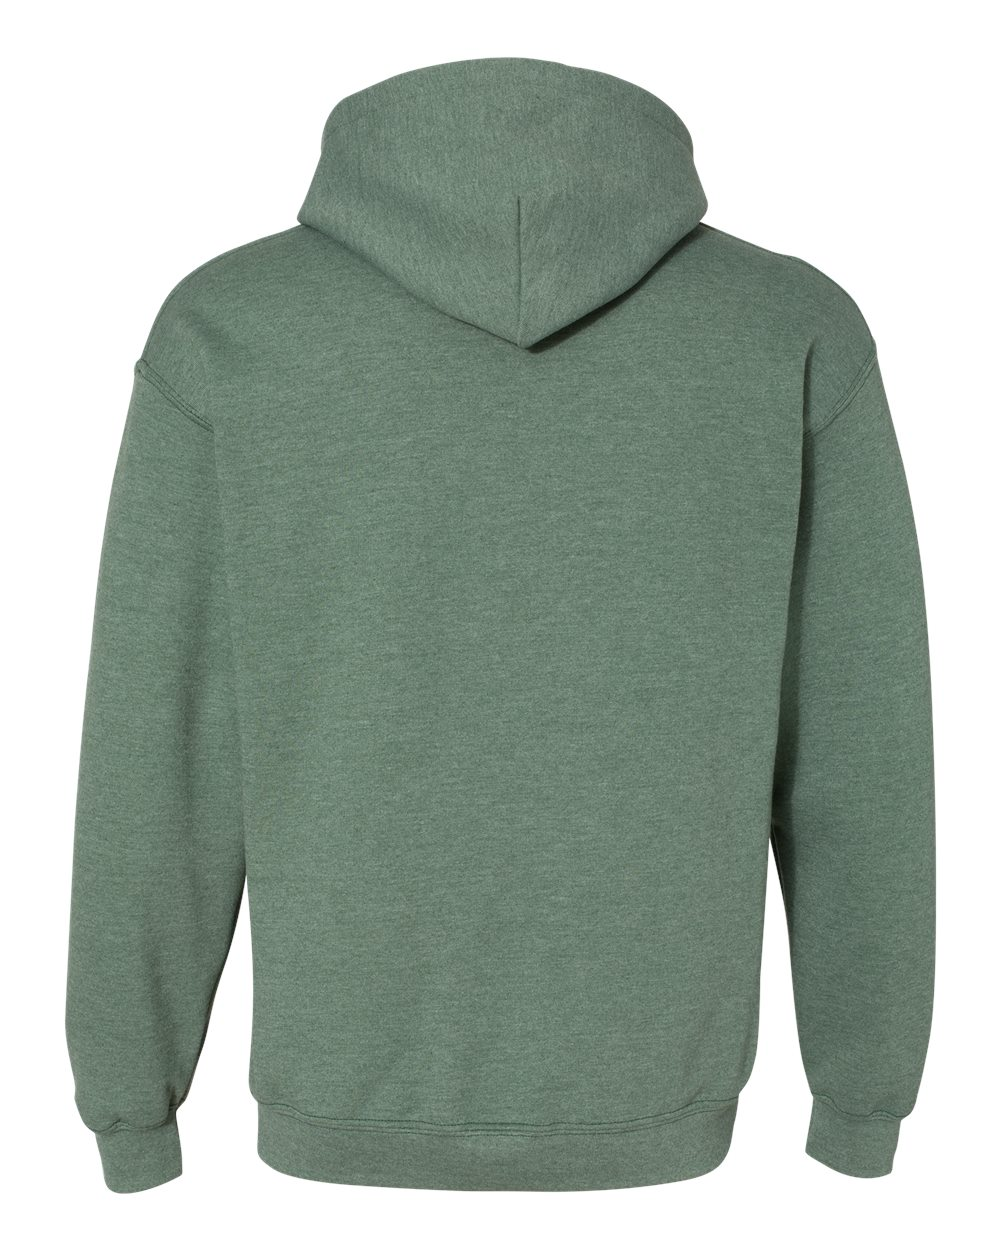 Gildan-Mens-Blank-Hoodie-Heavy-Blend-Hooded-Sweatshirt-18500-up-to-5XL thumbnail 22